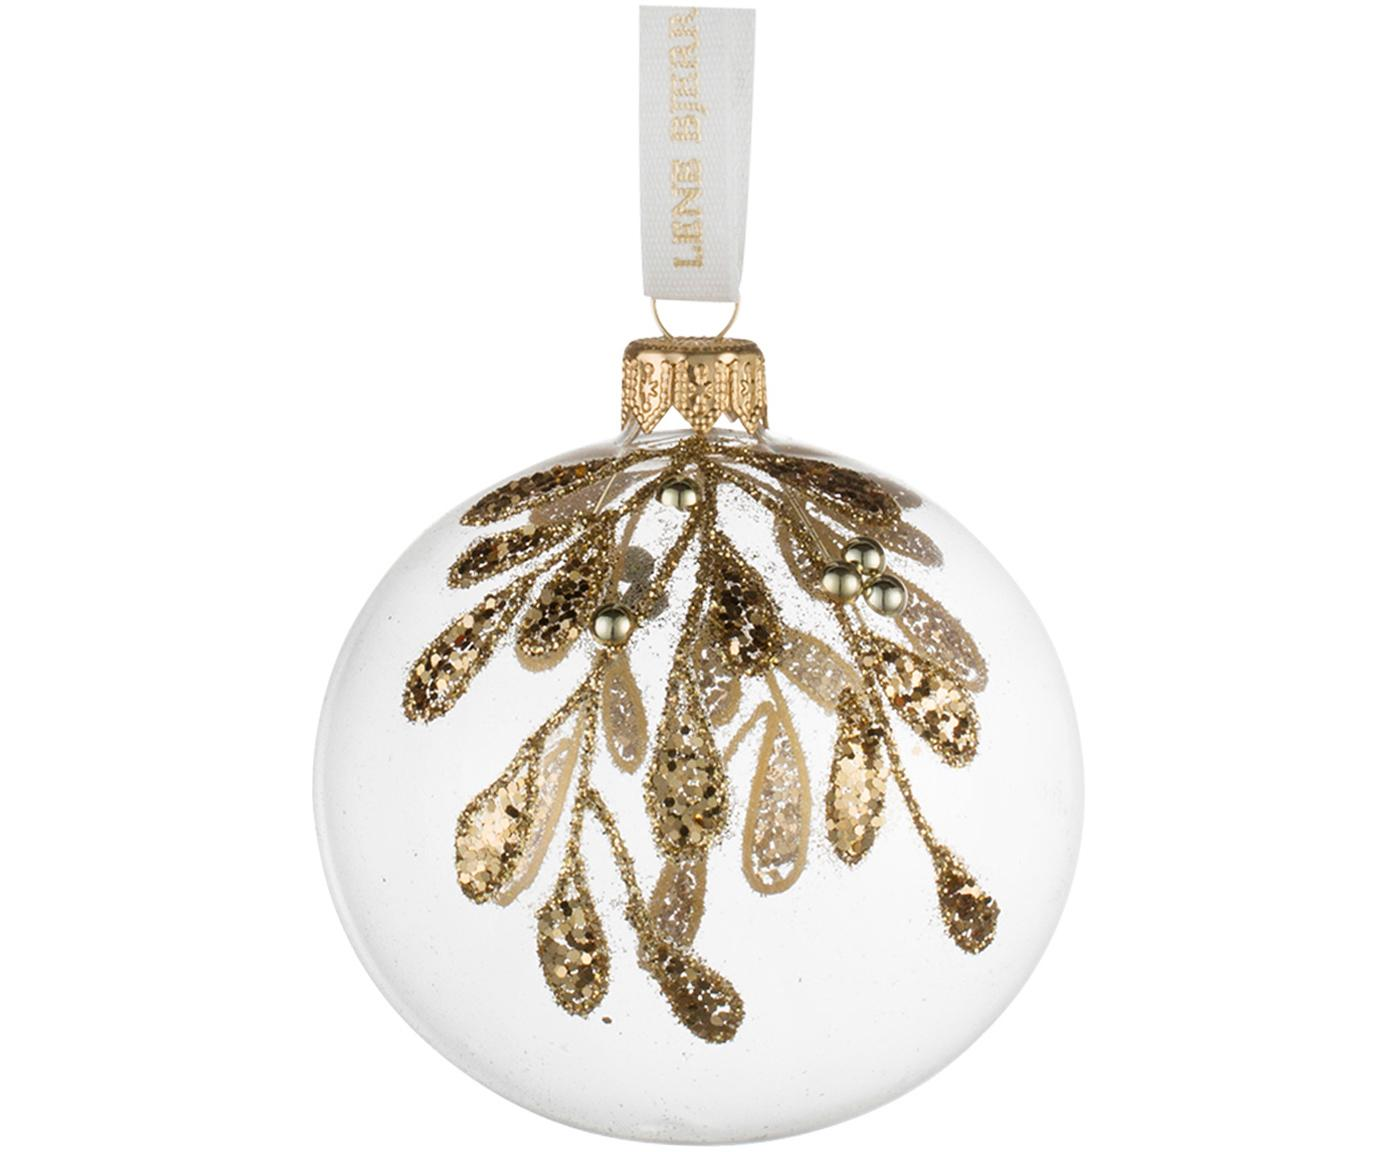 Weihnachtskugeln Cadelia Ø8cm, 2Stück, Transparent, Goldfarben, Ø 8 cm